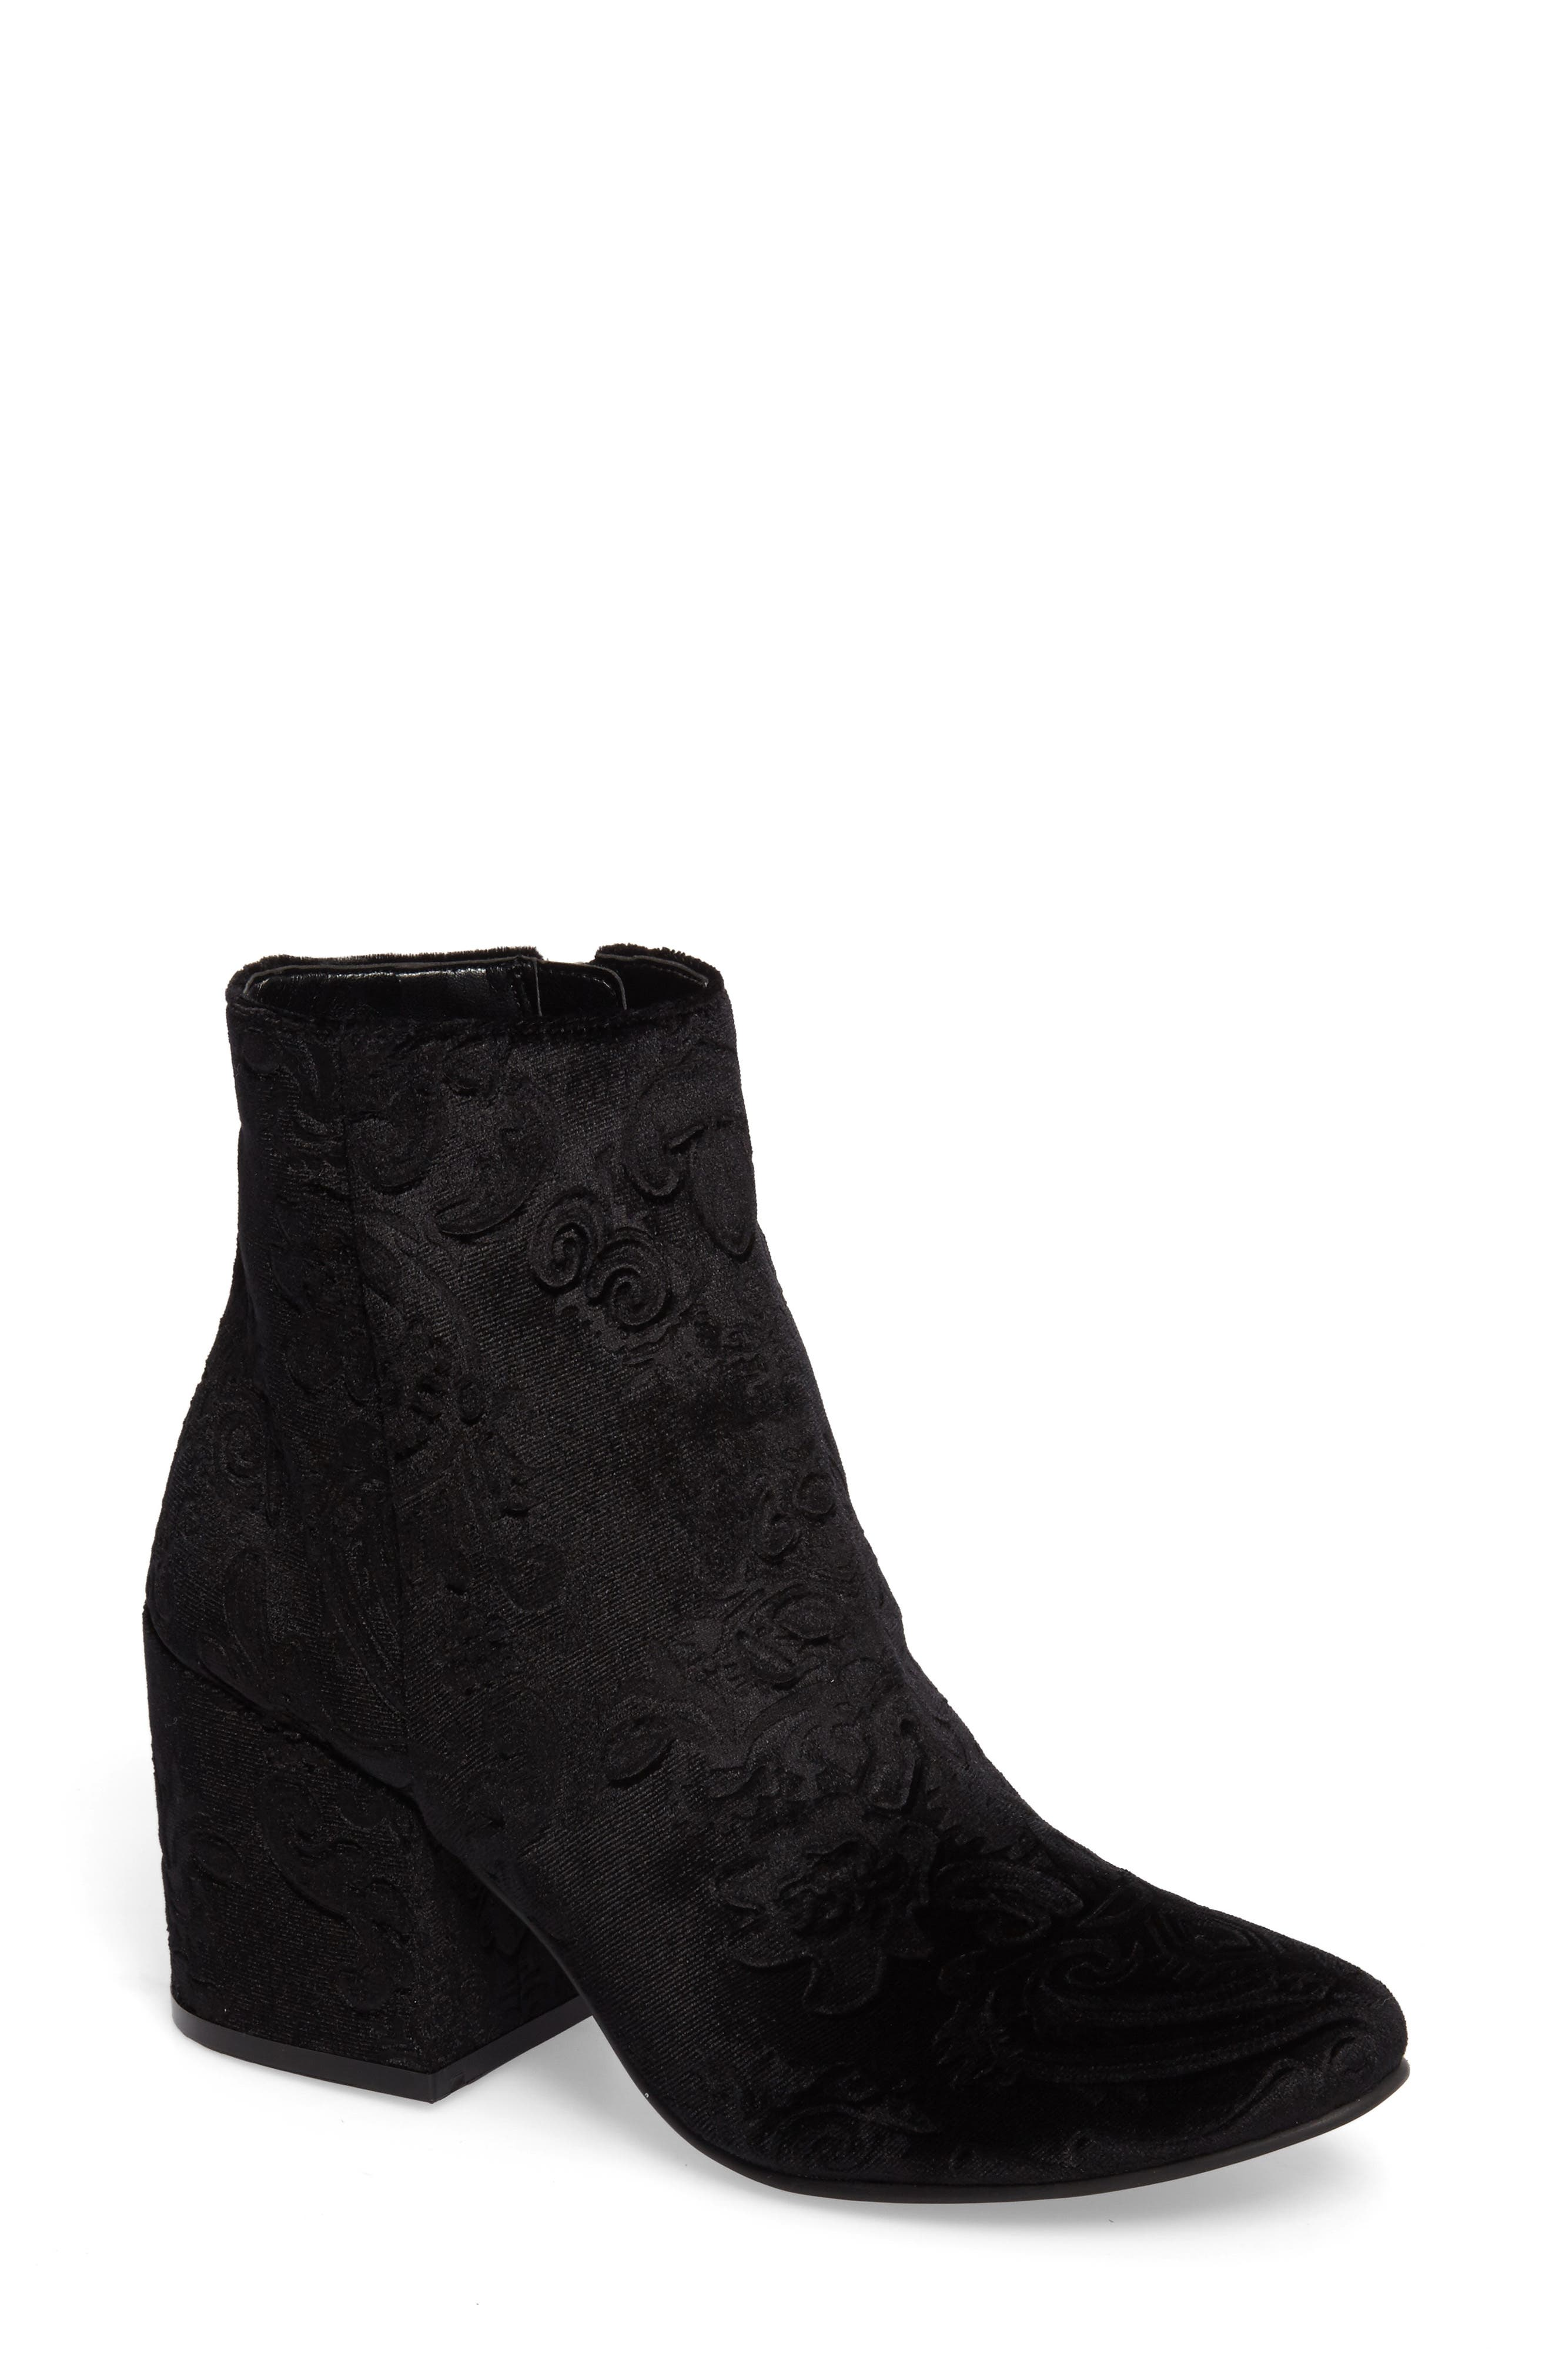 Marian Block Heel Bootie,                             Main thumbnail 1, color,                             Black Embossed Velvet